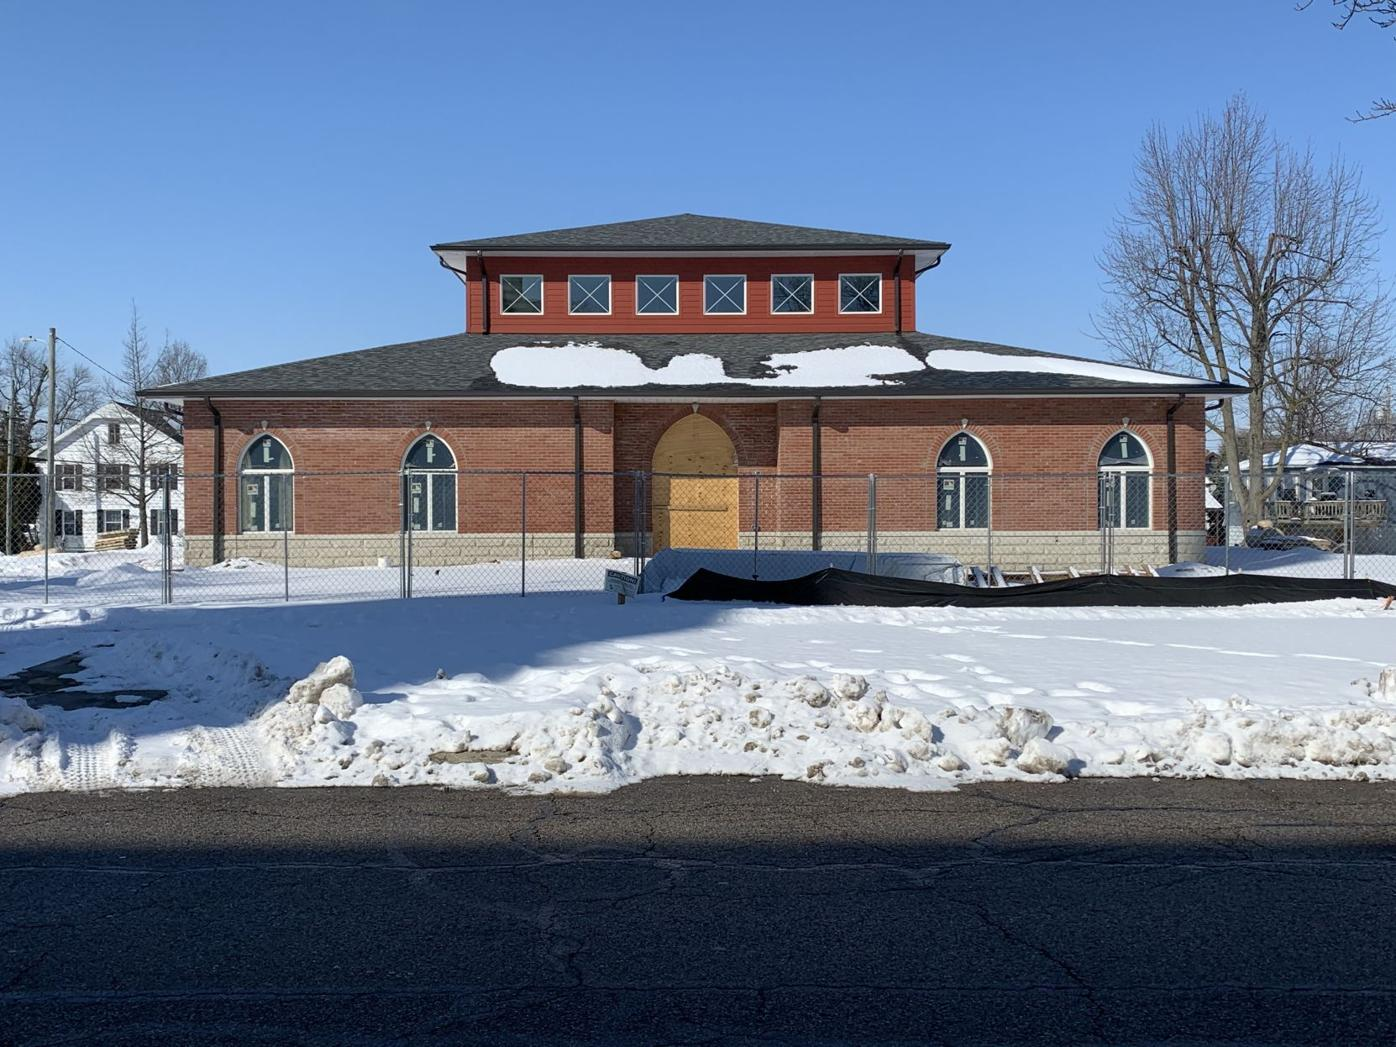 St. Augustine center front